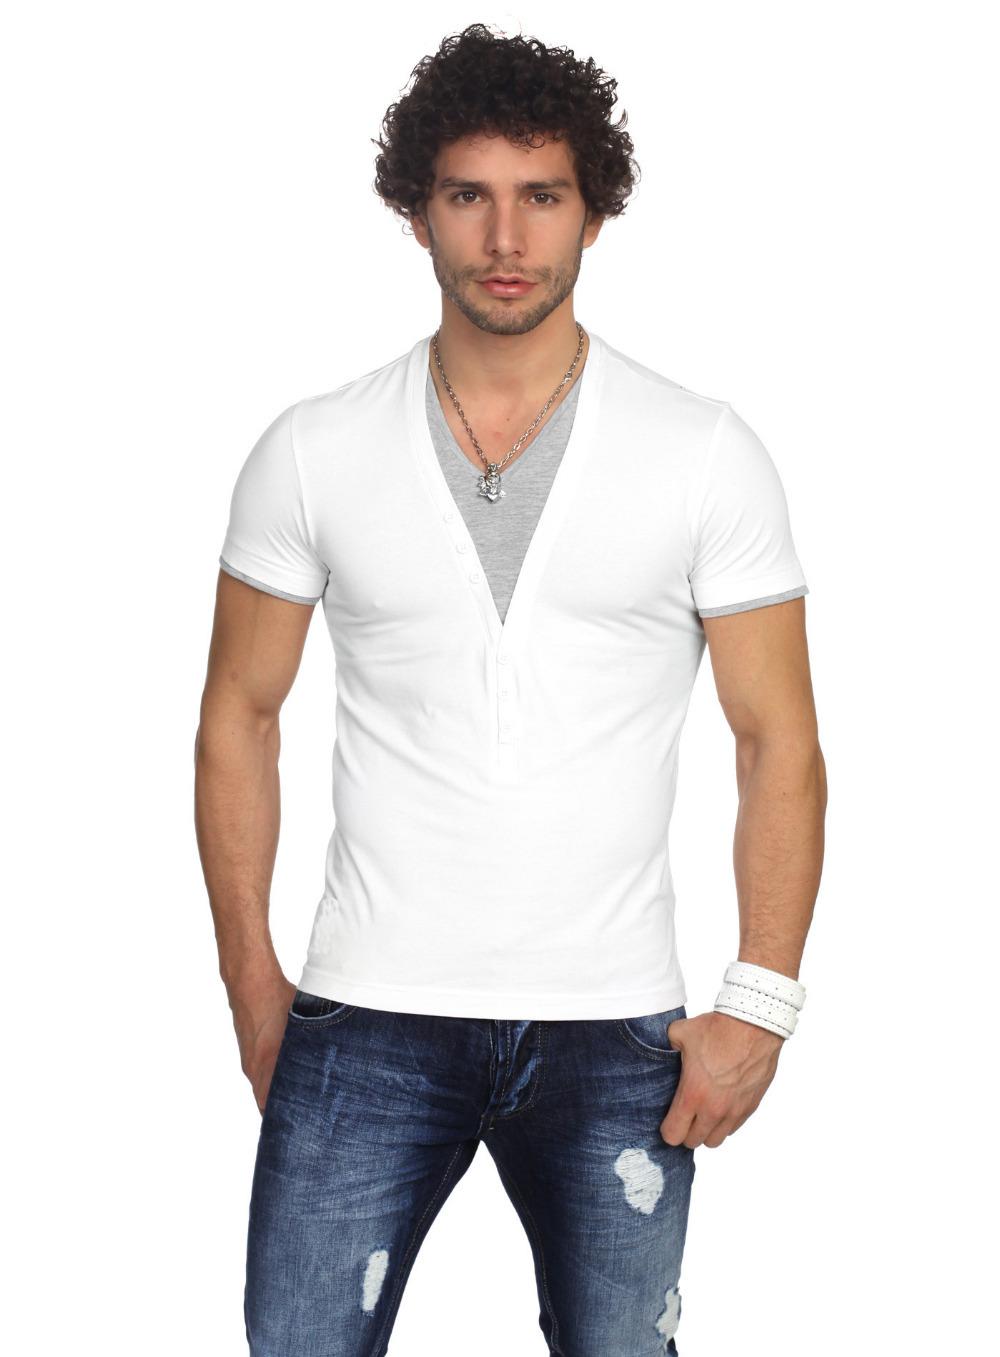 European Mens Clothes For Sale 6